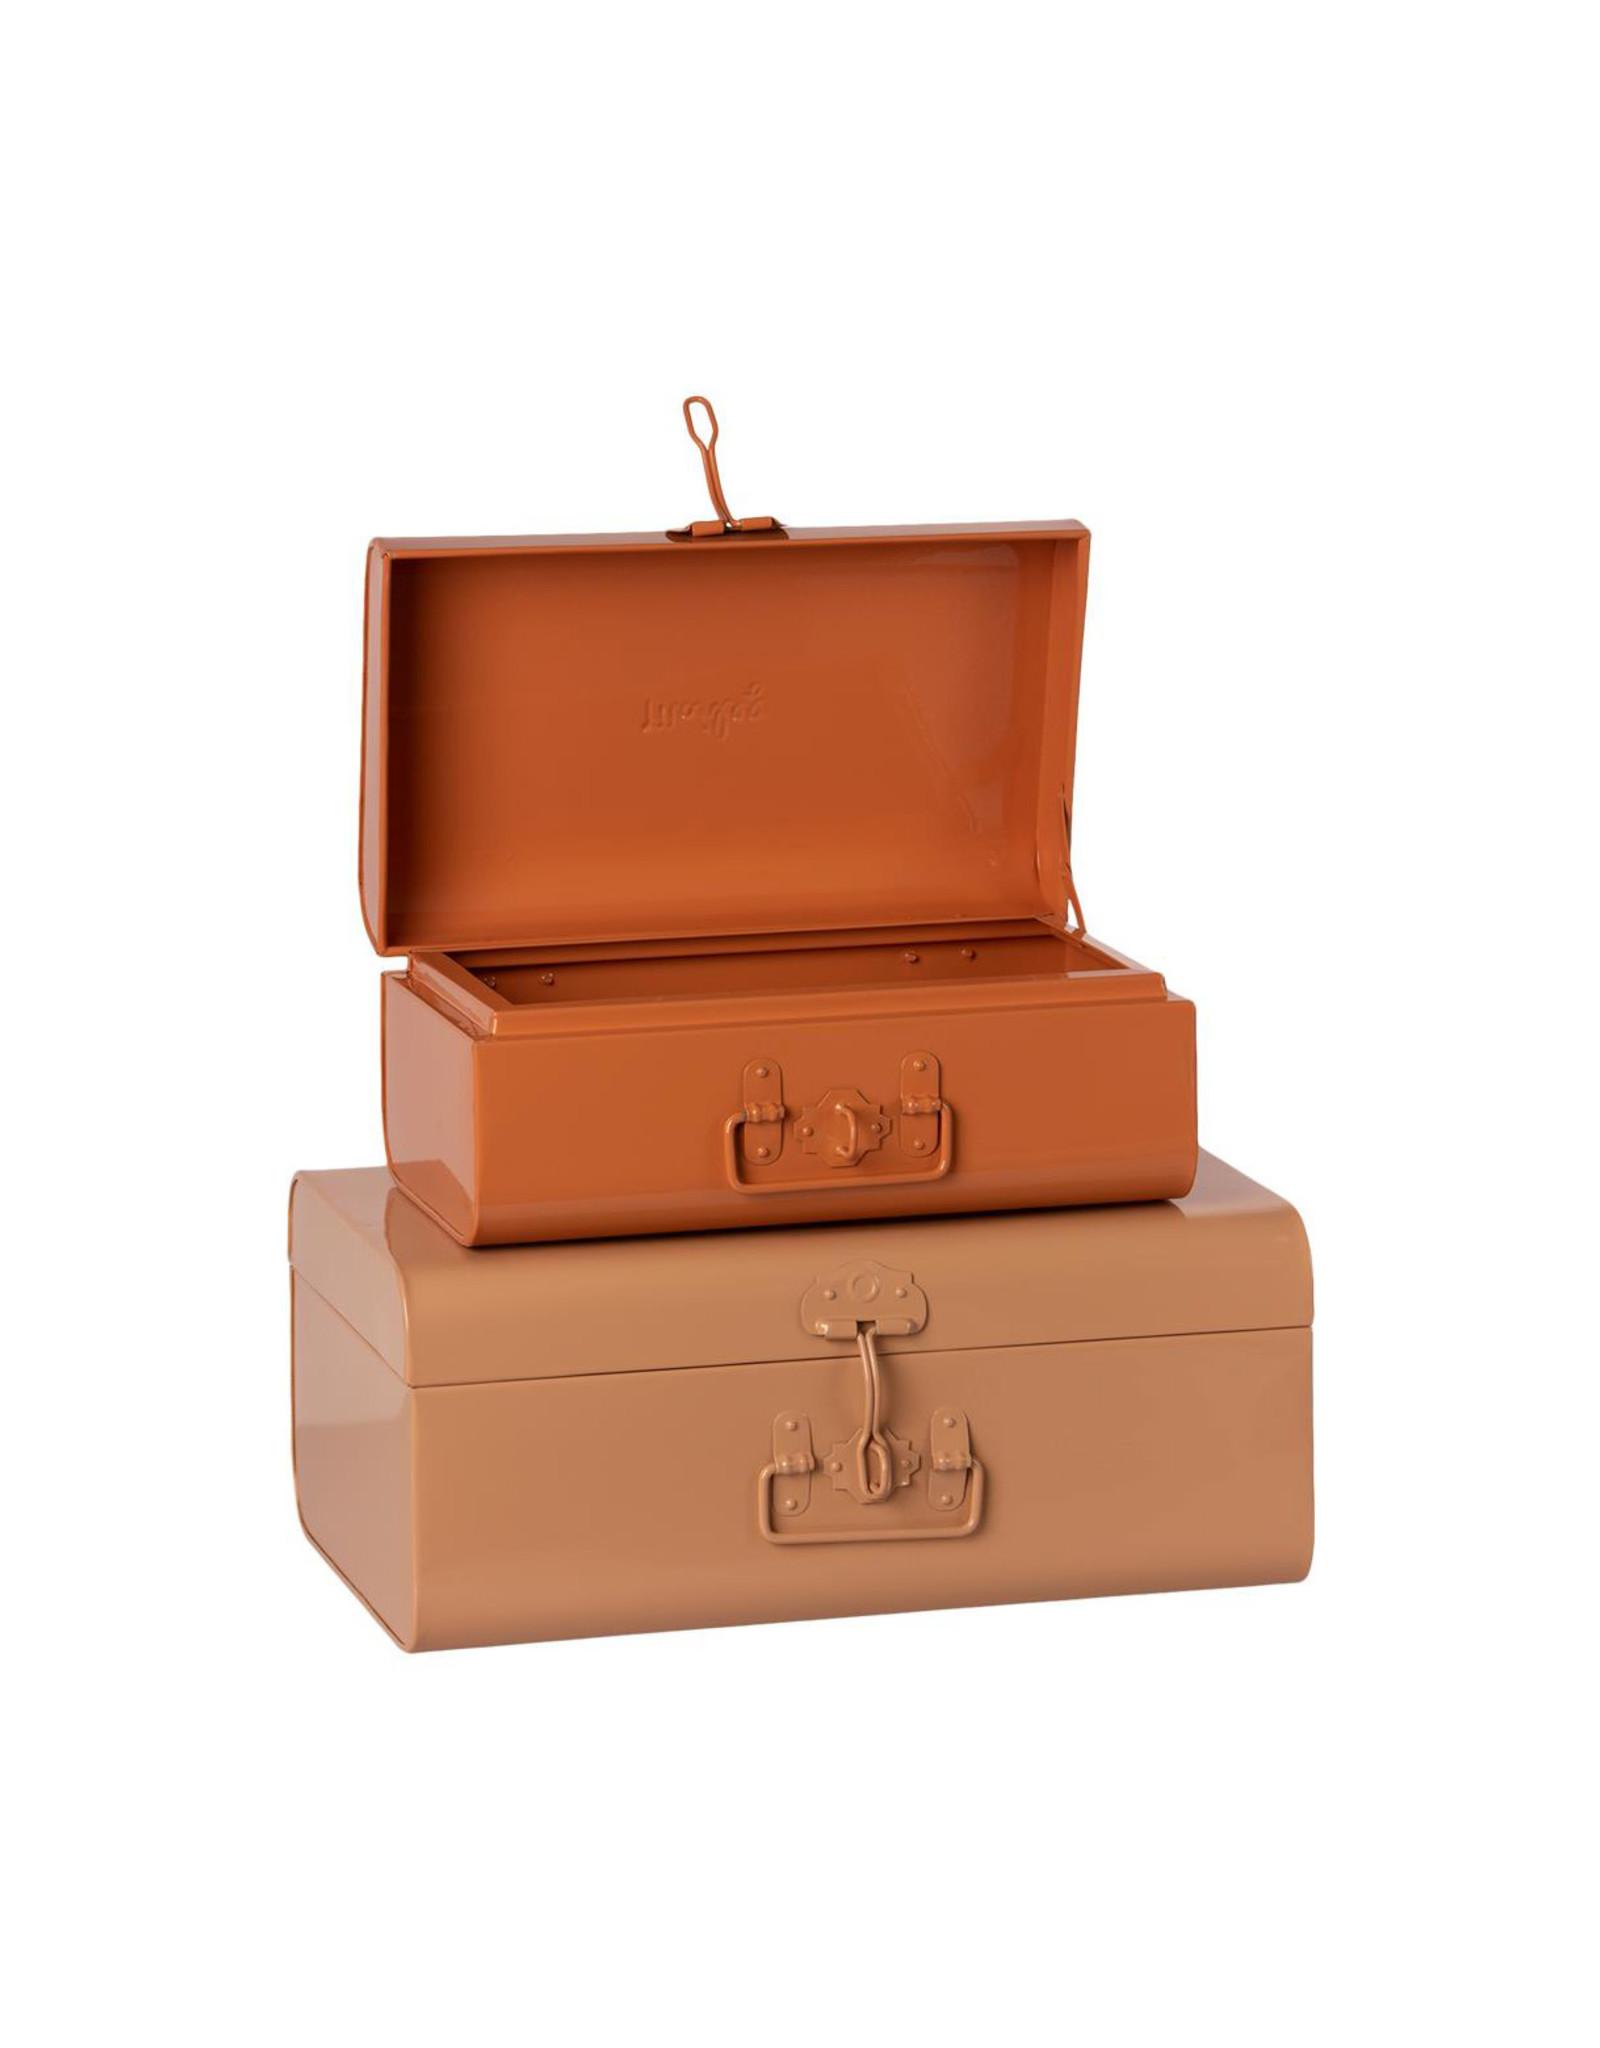 Maileg Large Storage Suitcase - Powder